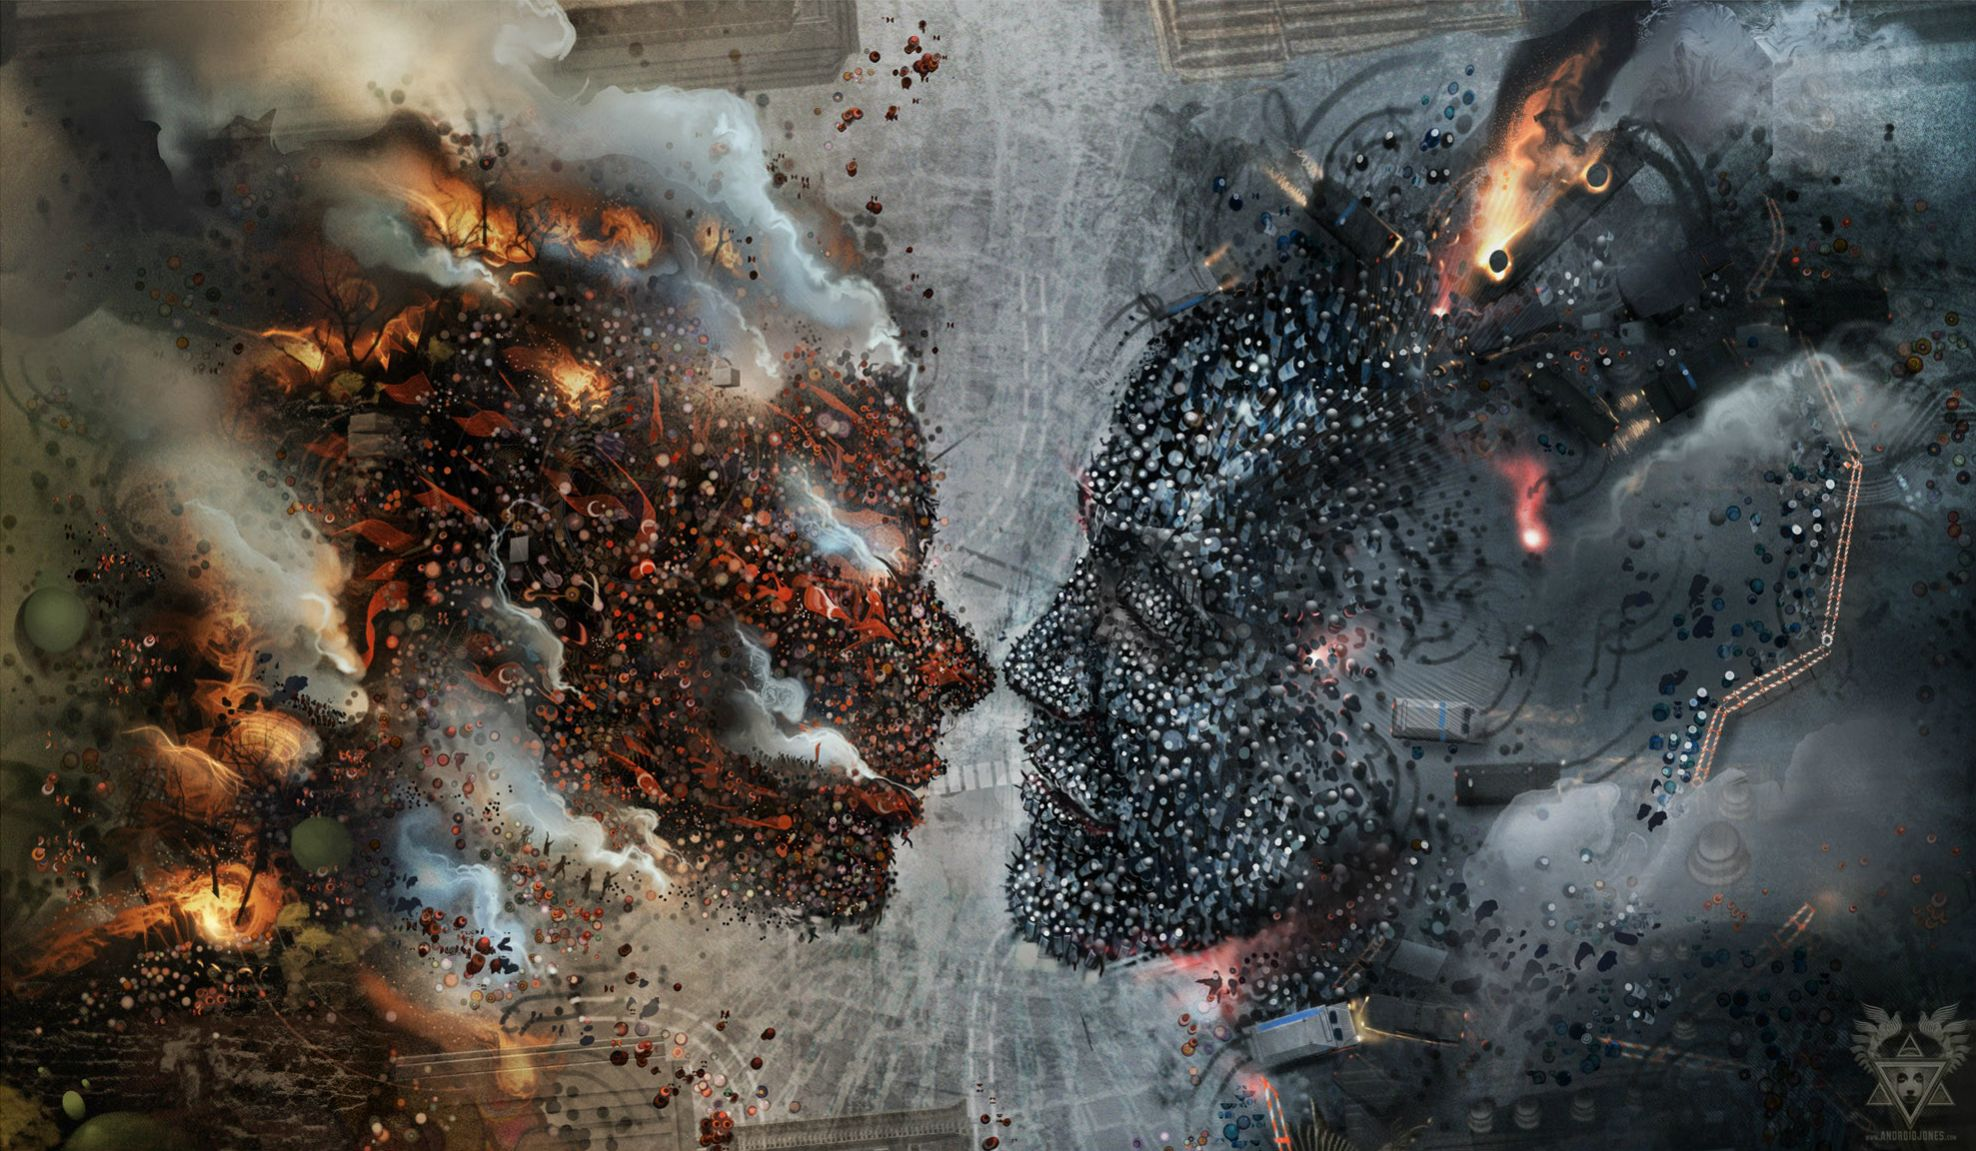 General 1976x1151 riots police protestors artwork fantasy art face to face rebellion Rebels rebel digital art